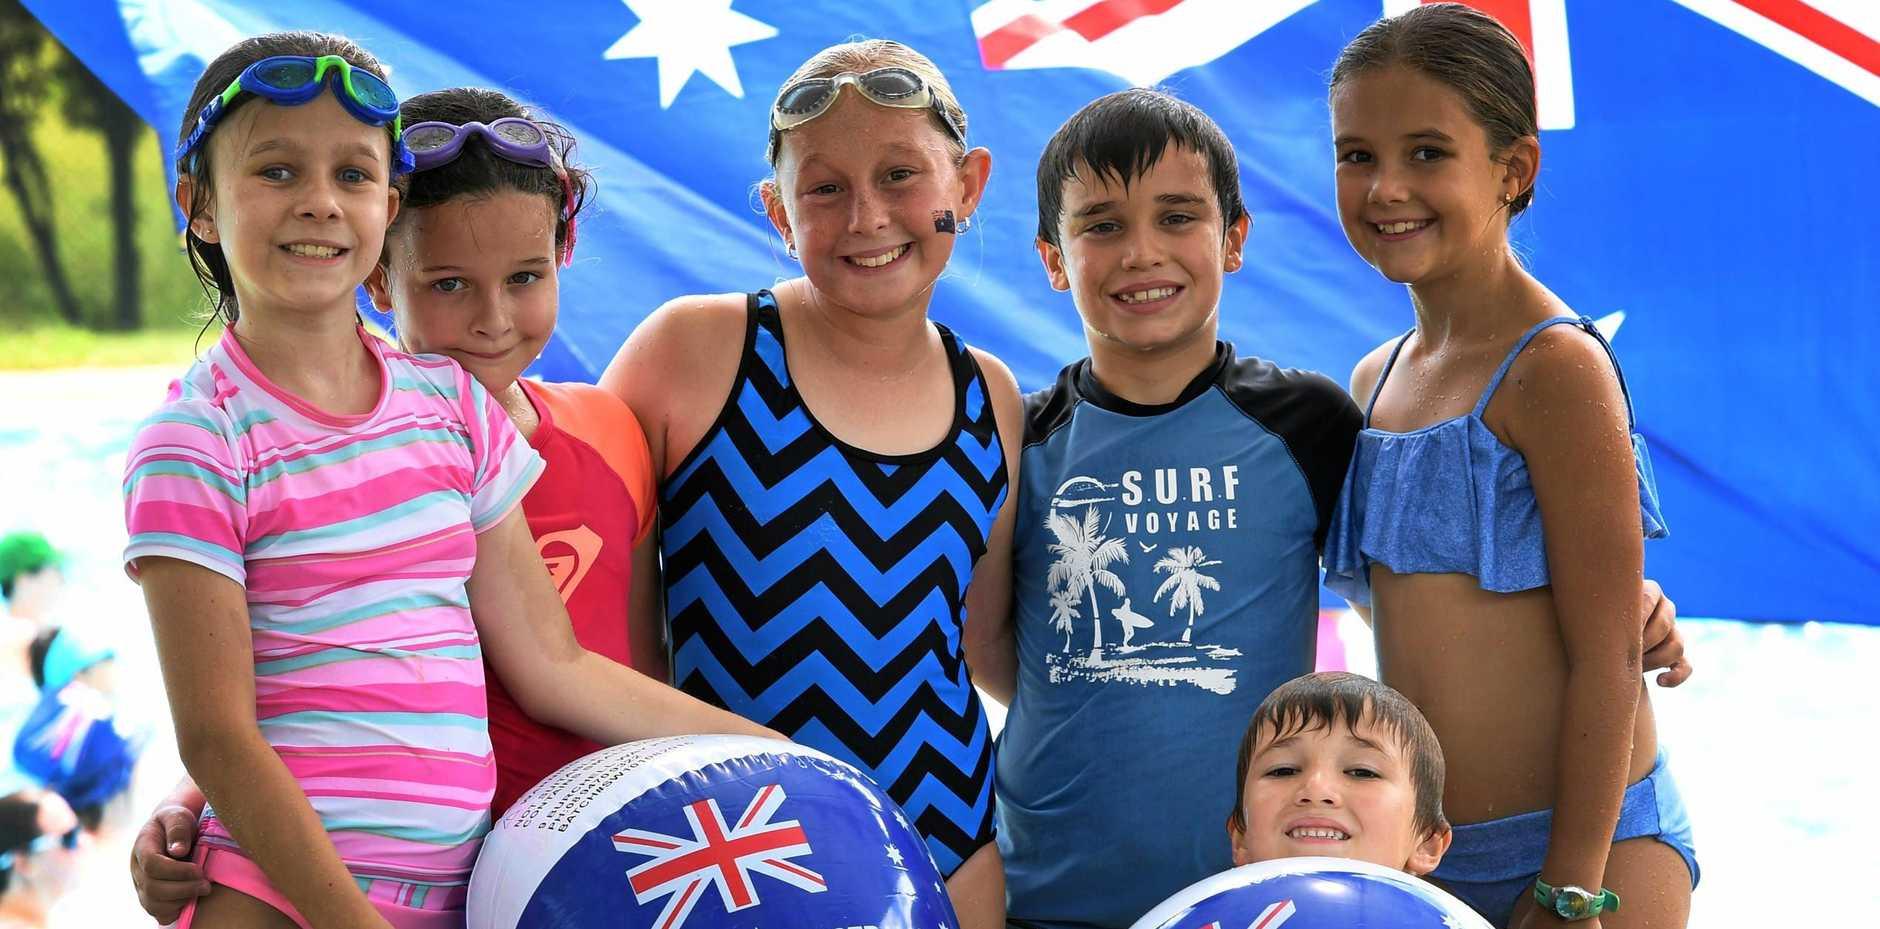 AUSTRALIAN: An Australia Day Aqua Aerobics Fundraiser will be held by DNA Aqua Aerobics at Kepnock State High School pool from 9am.